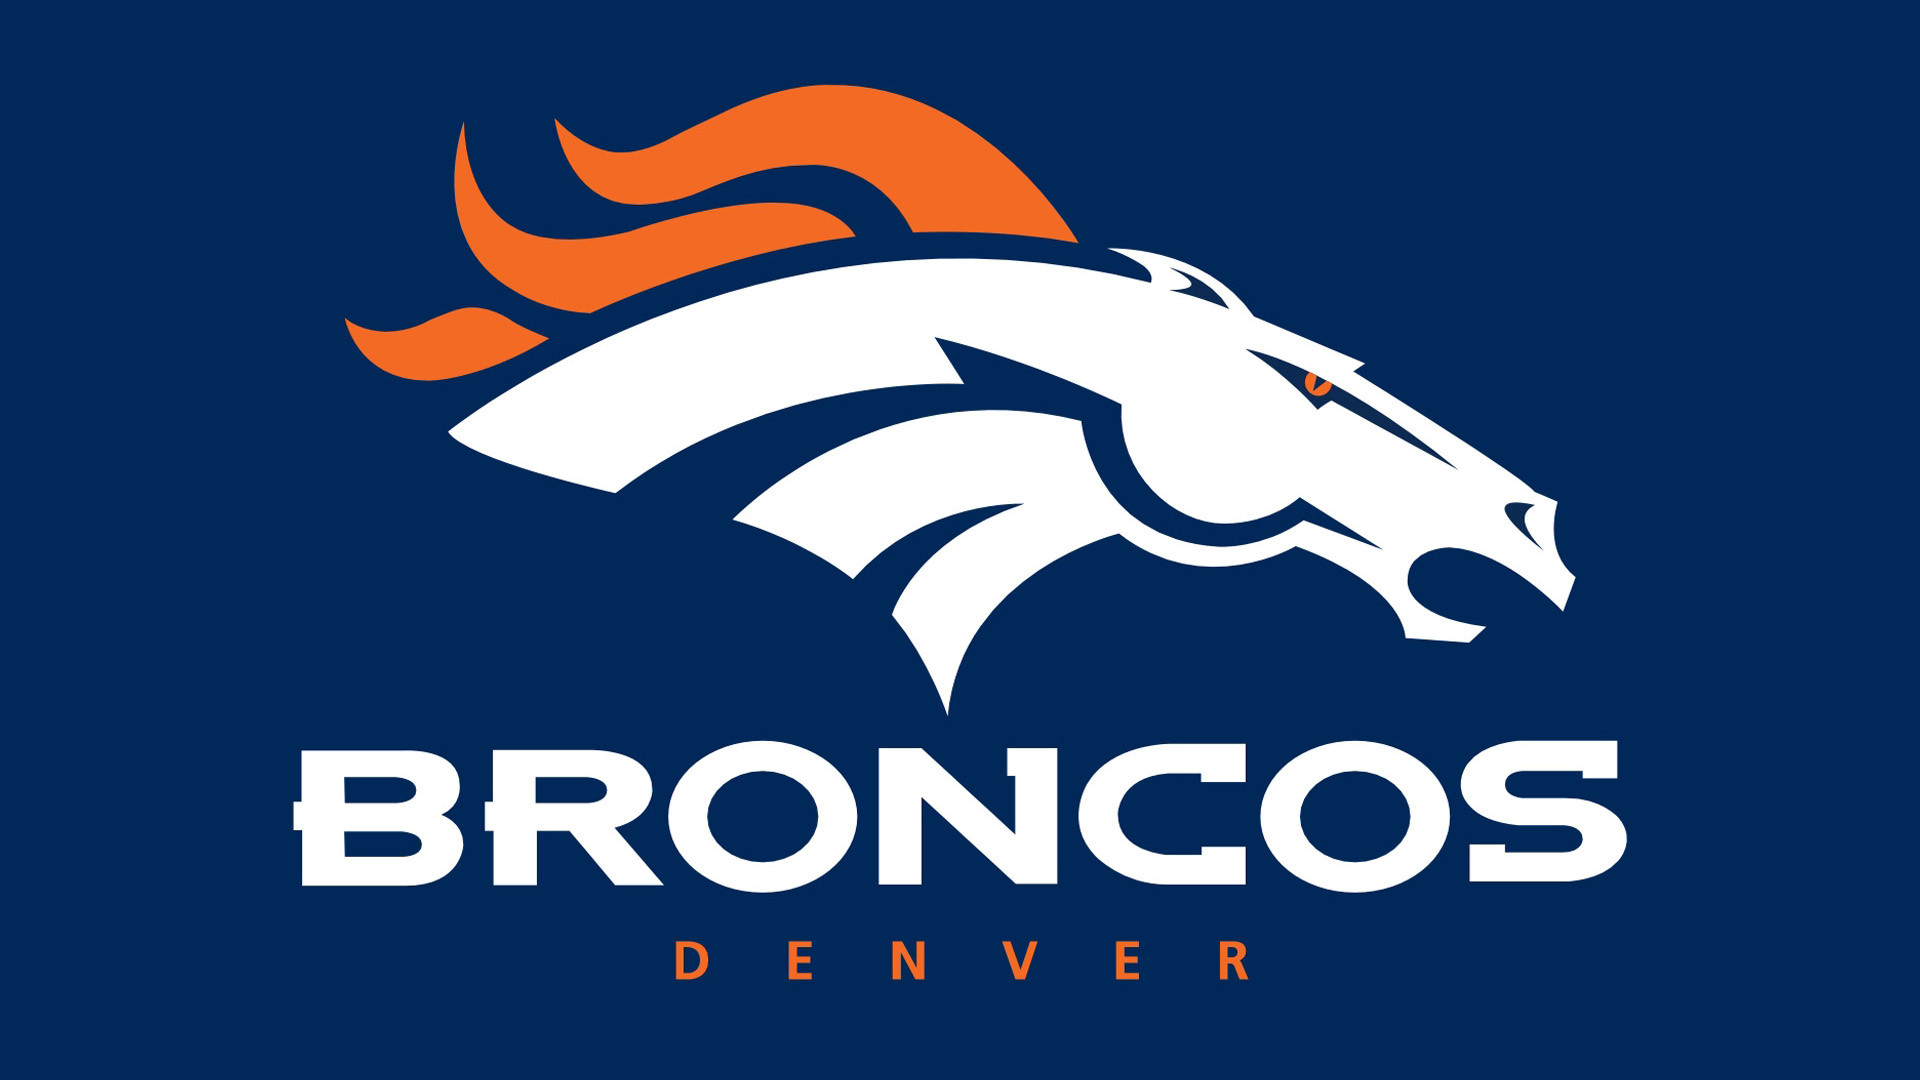 Denver Broncos Horse Logo HD Image Sports / NFL Football